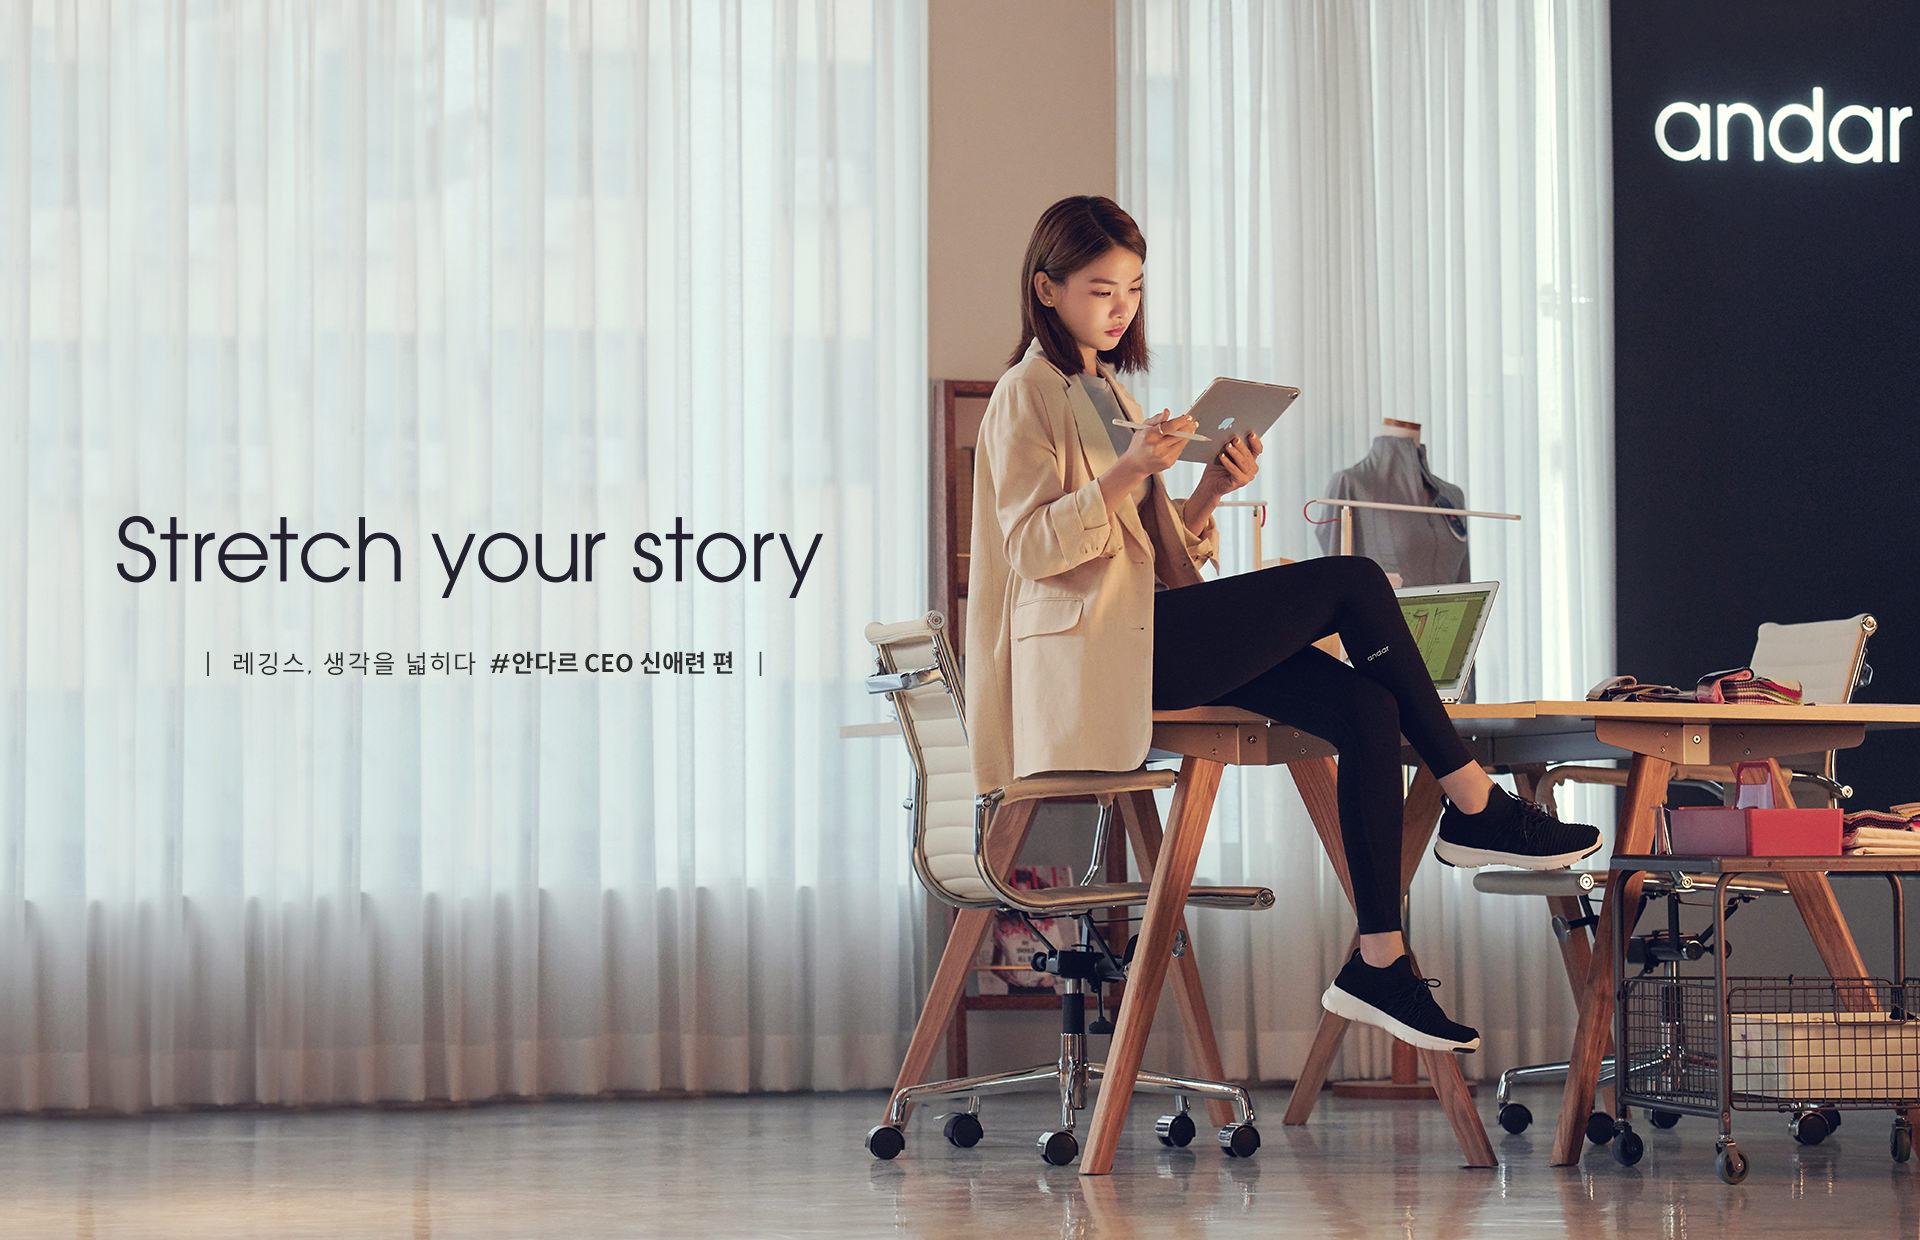 strech your story 레깅스 생각을 넓히다